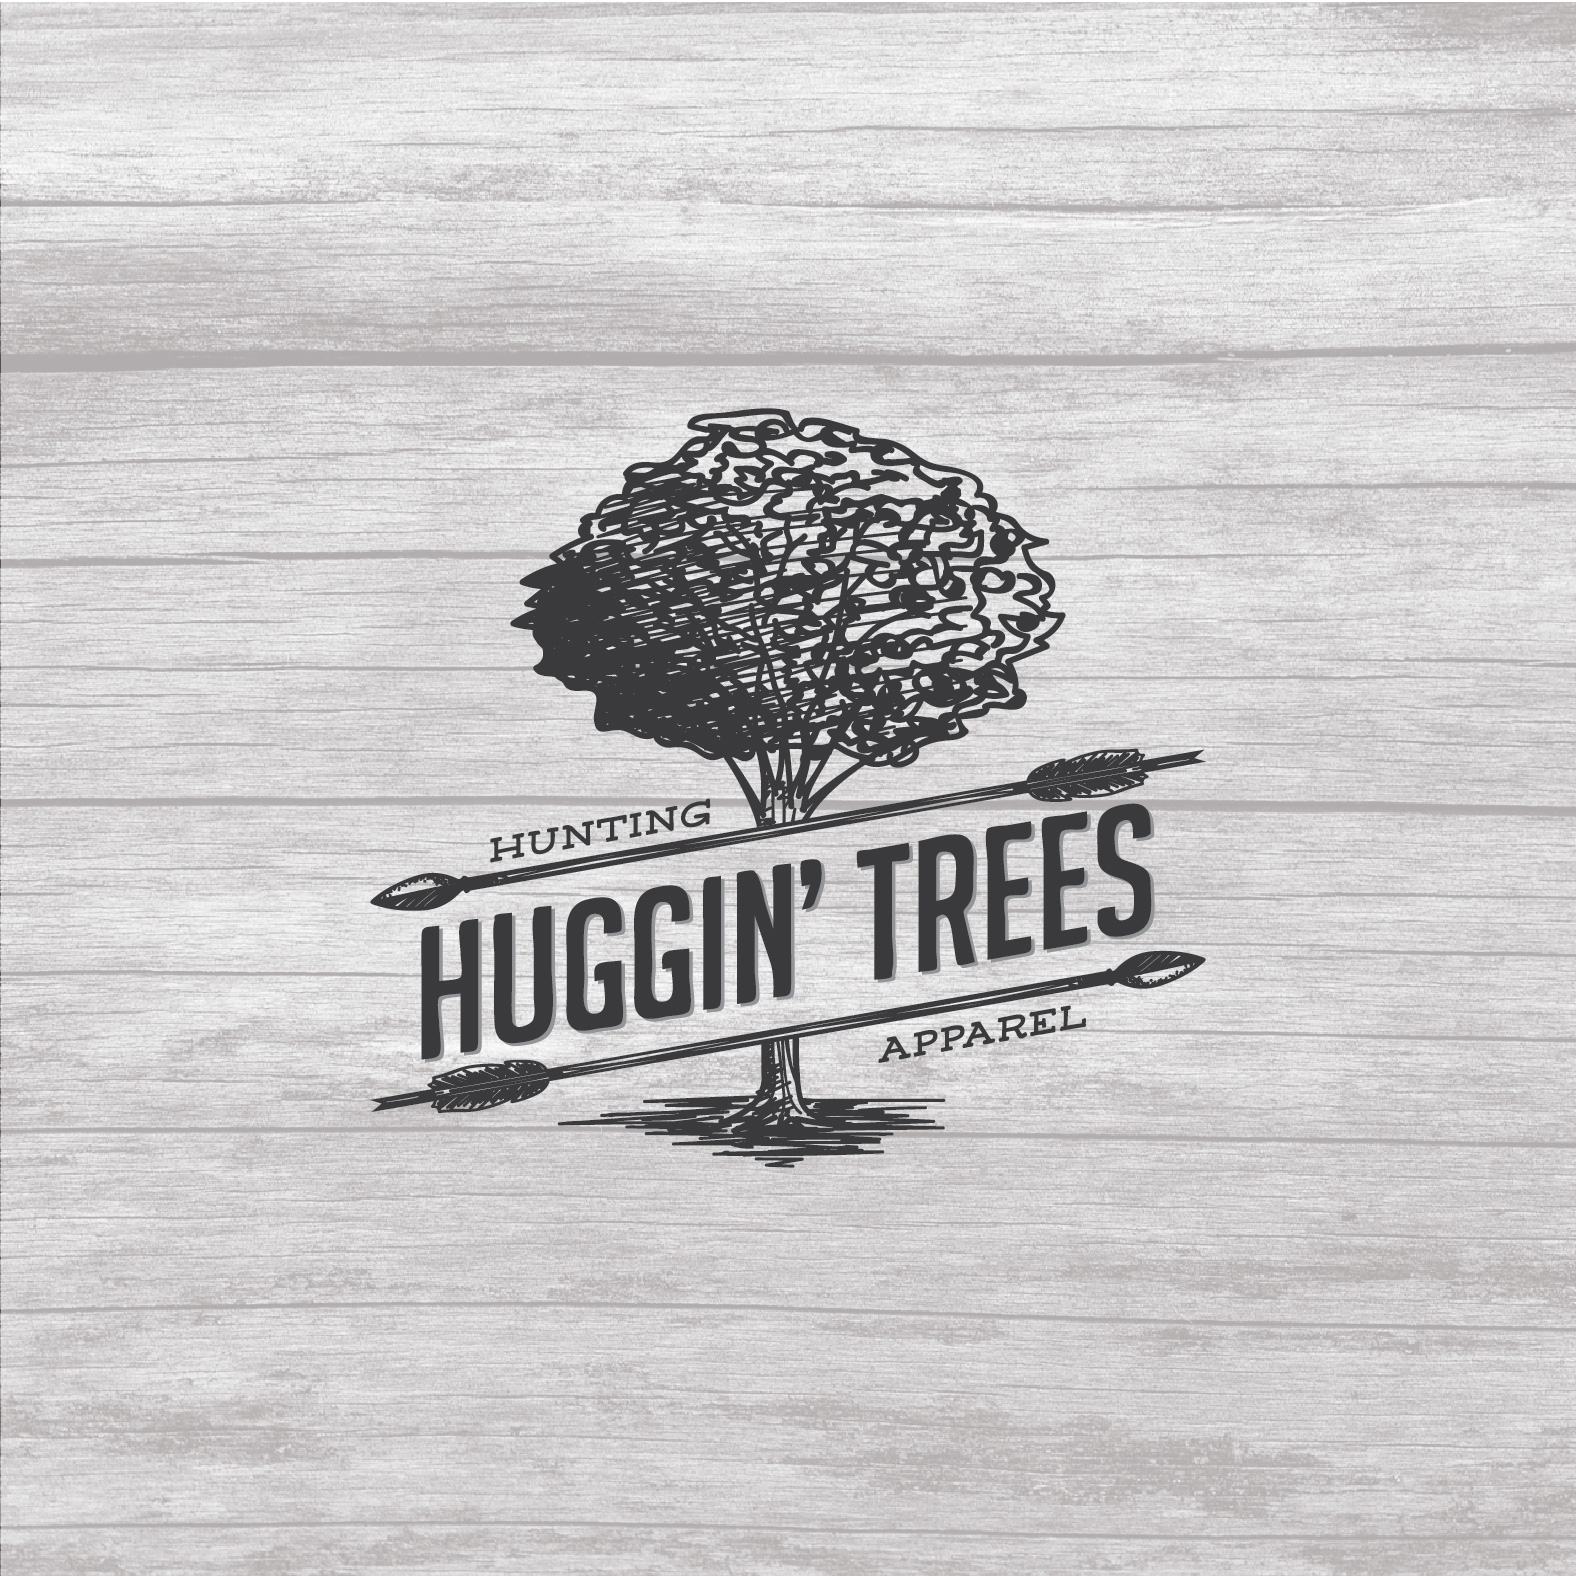 HugginTreesLogo_Submit-01.jpg